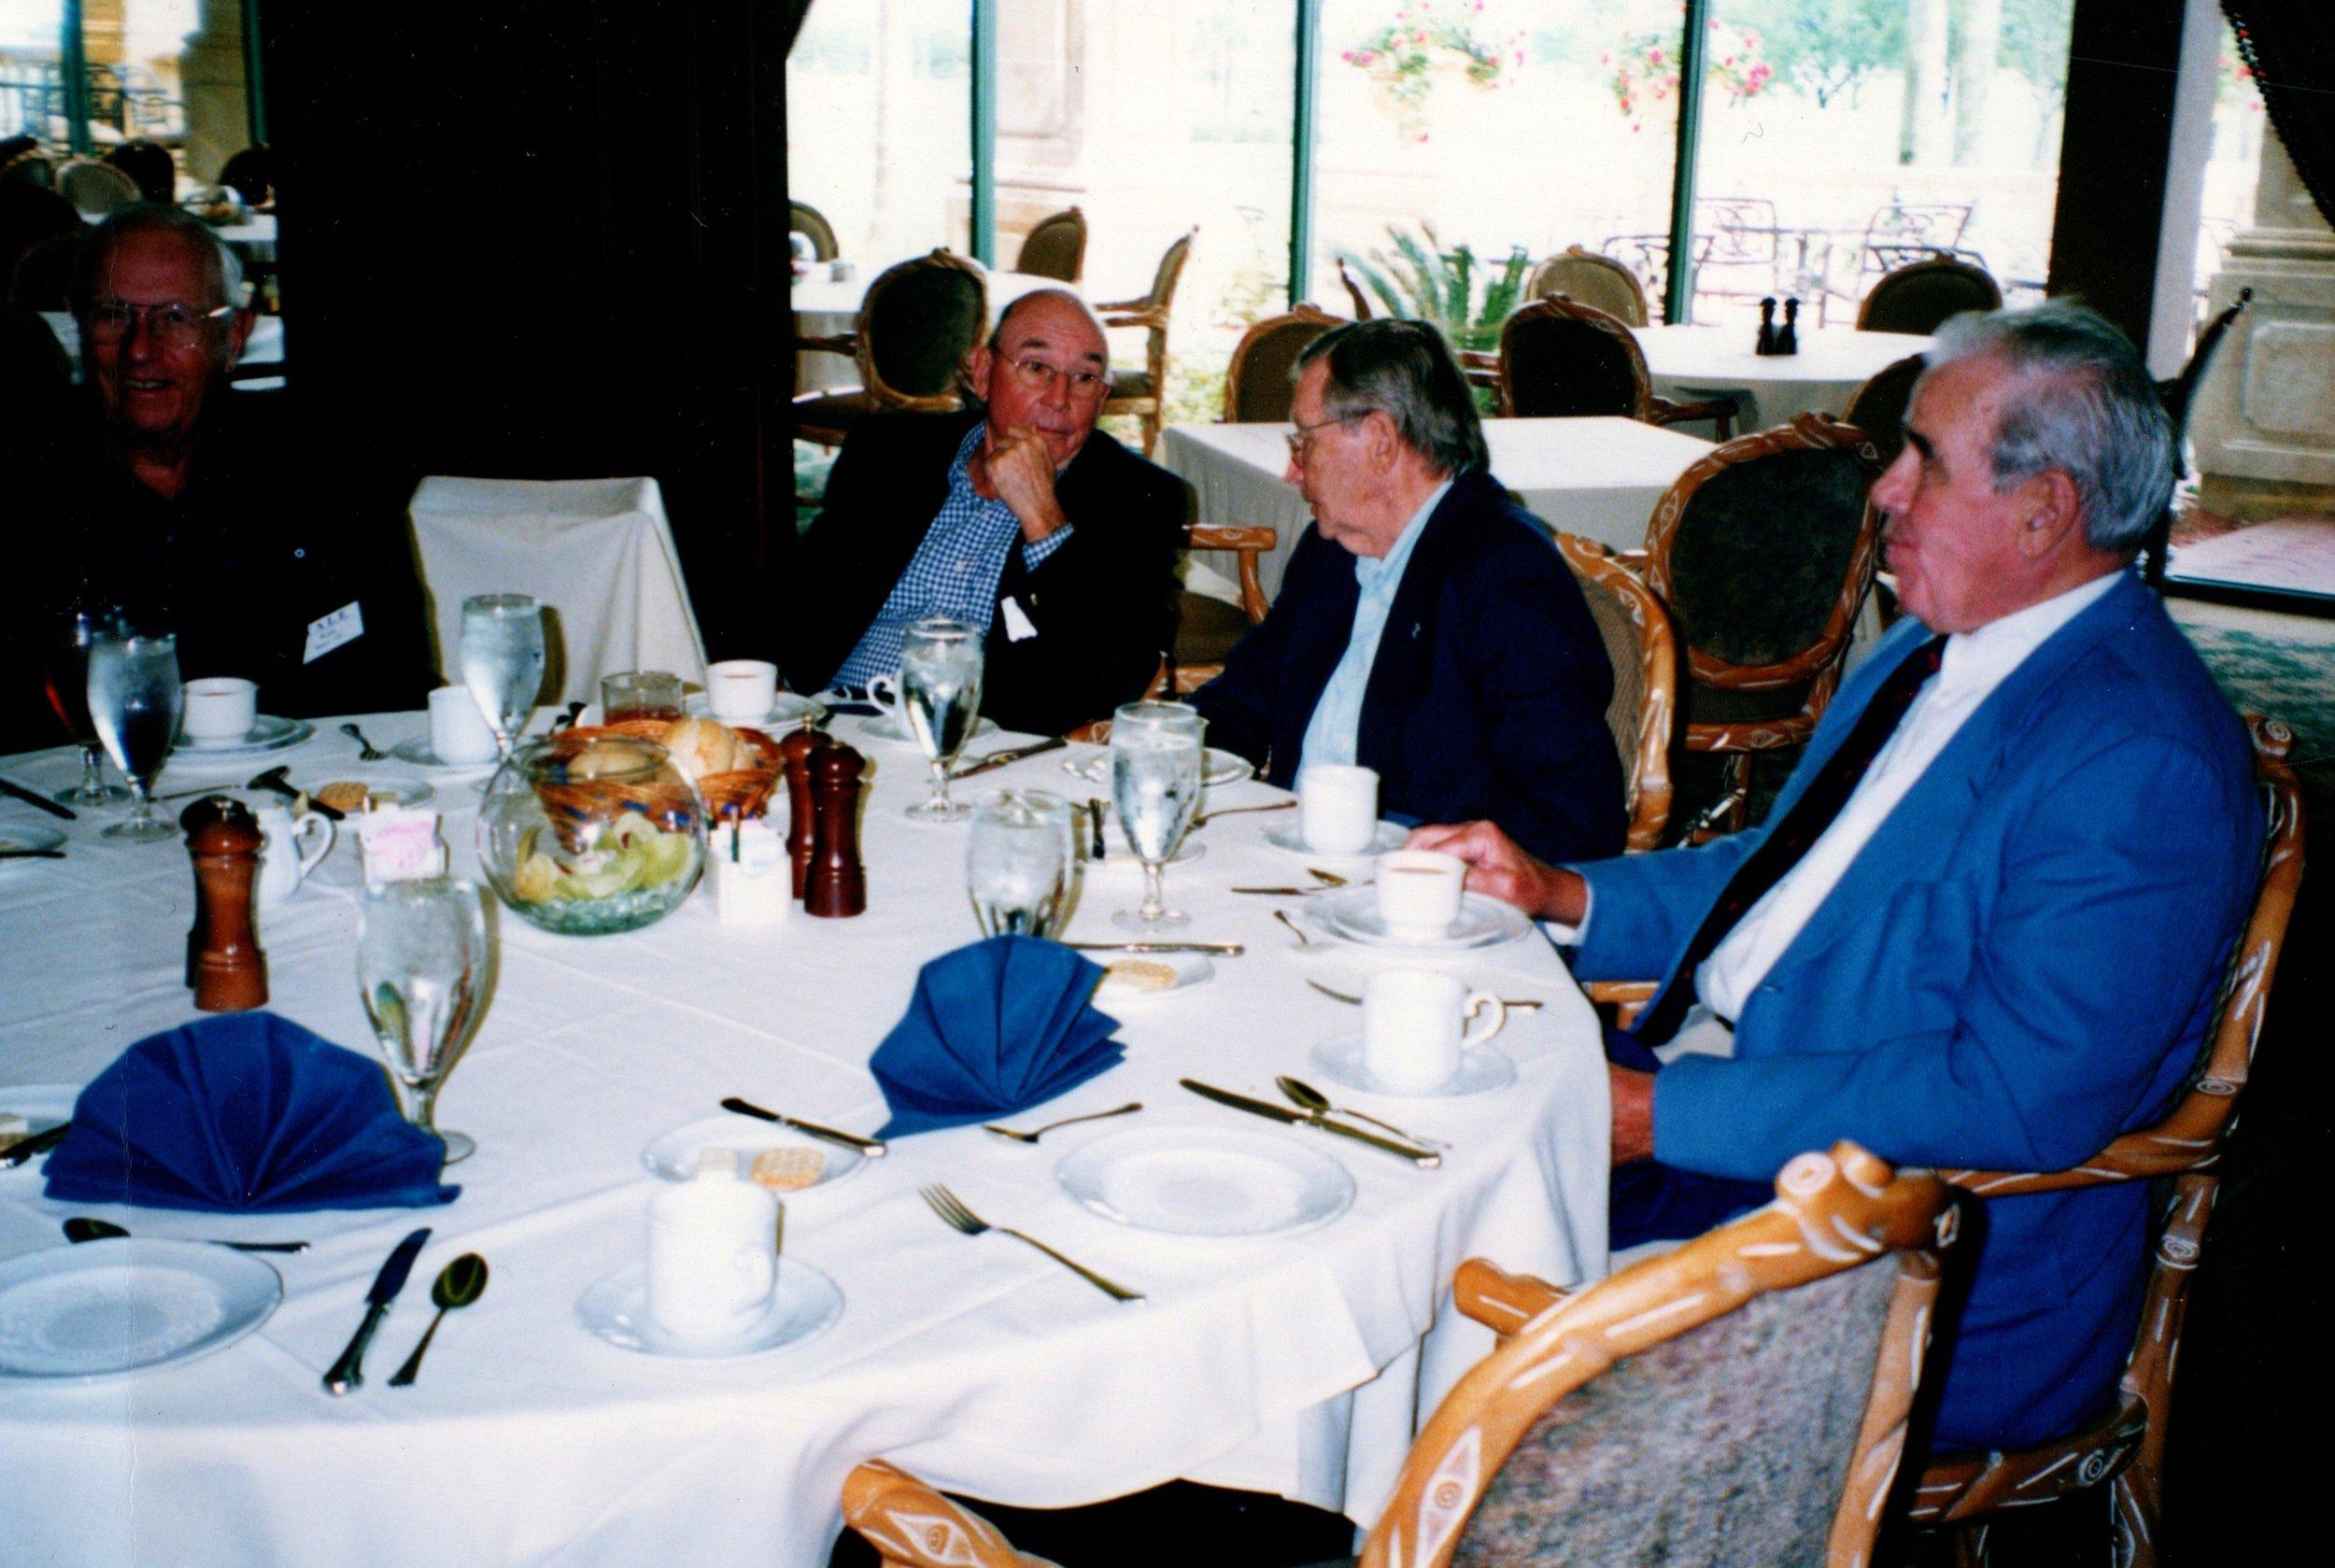 3_13_2003 - COACH SIEDLECKI LUNCHEON - VINEYARDS COUNTRY CLUB 6.jpg